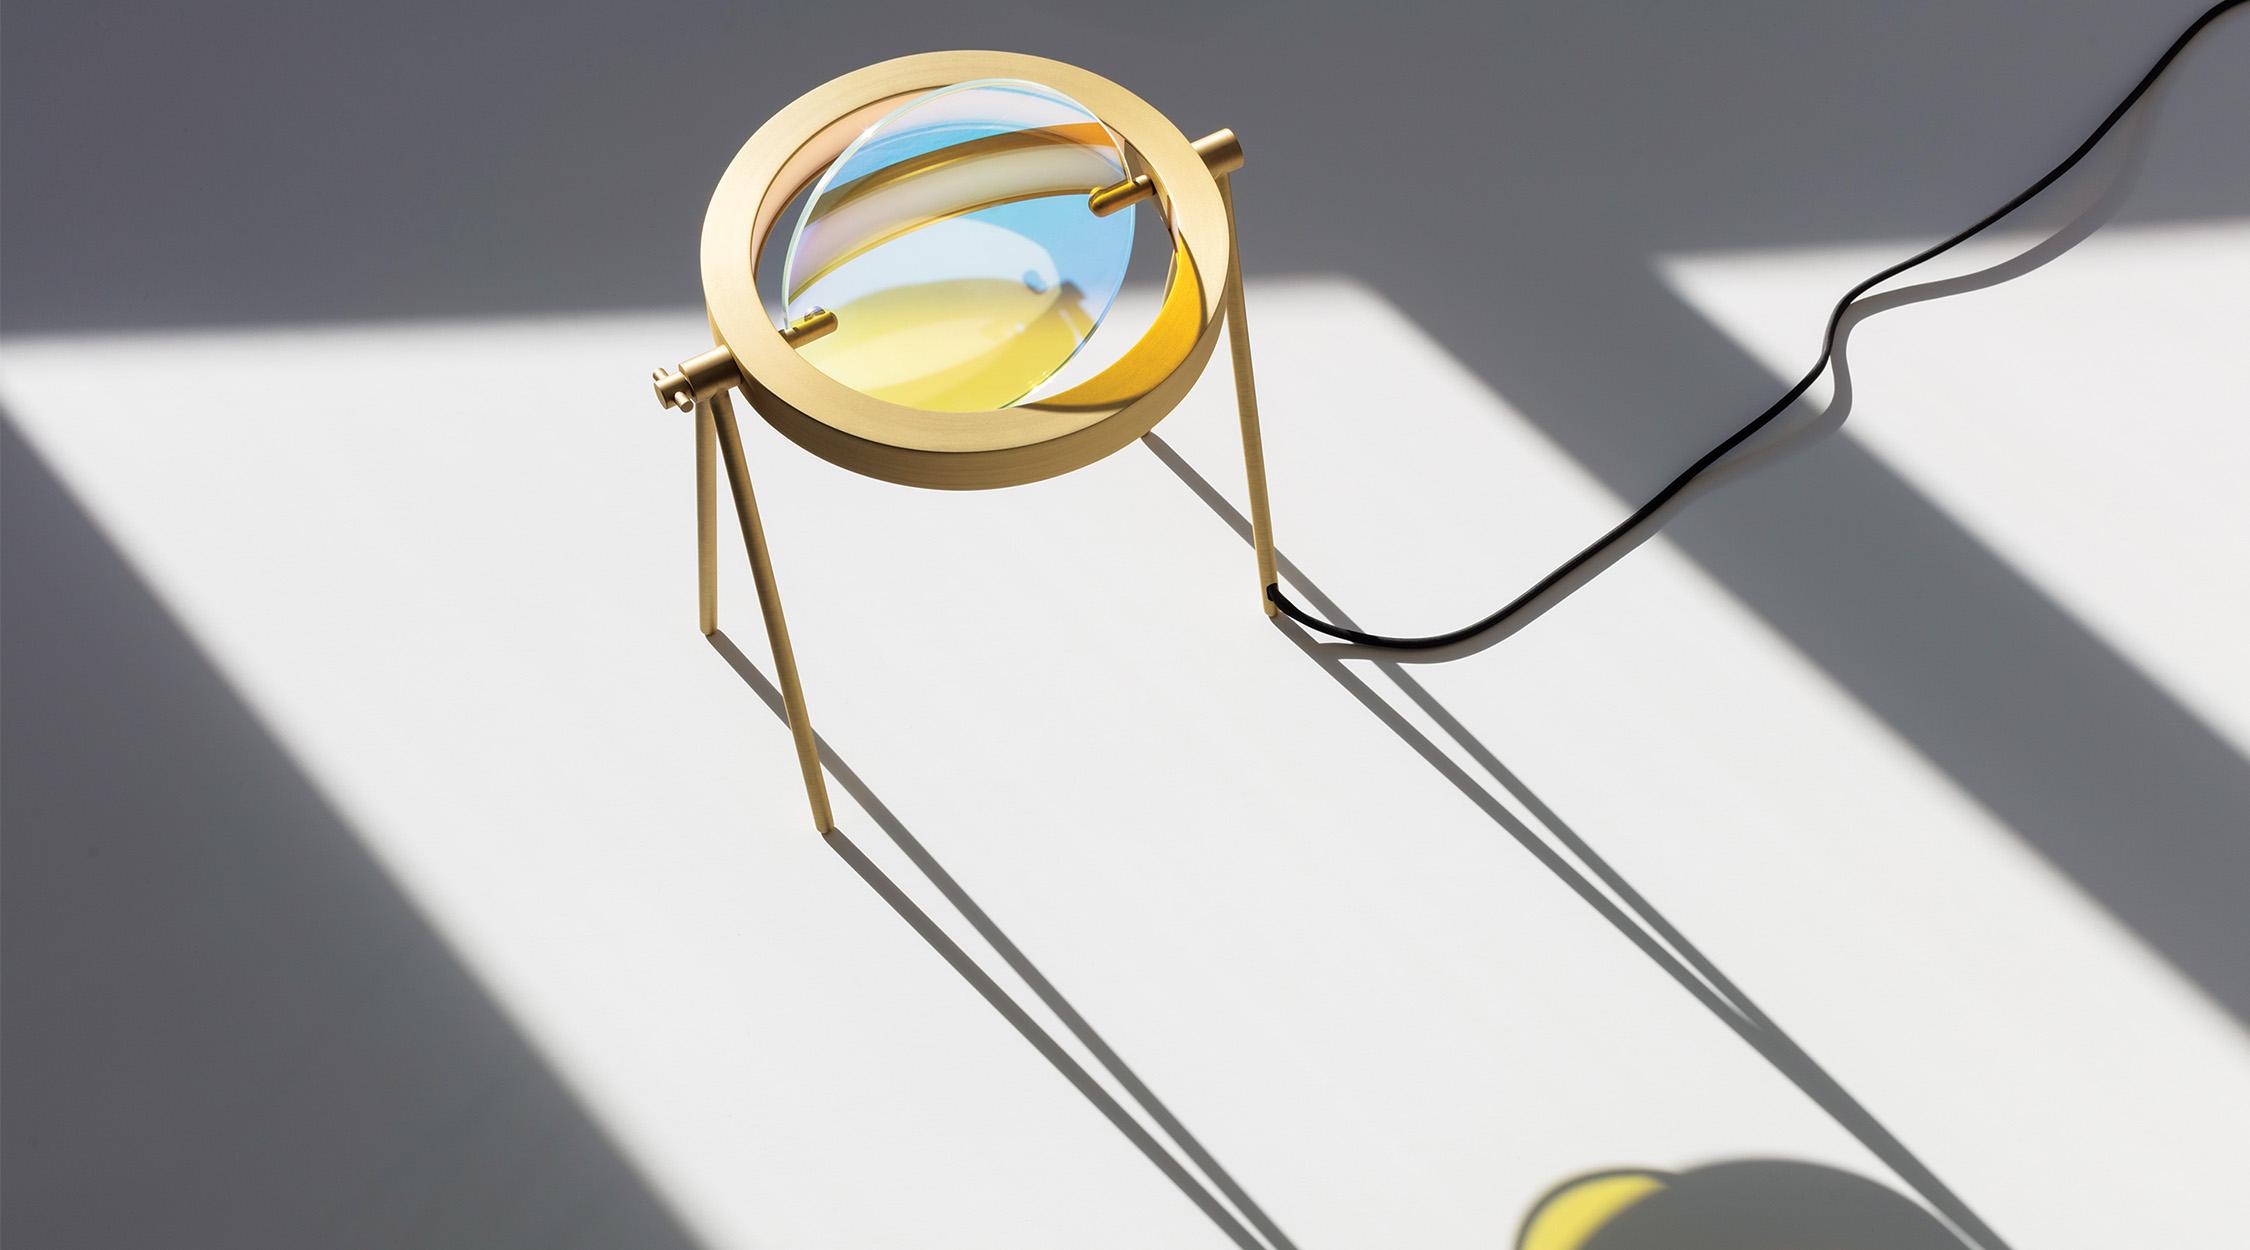 Janus light by Trueing